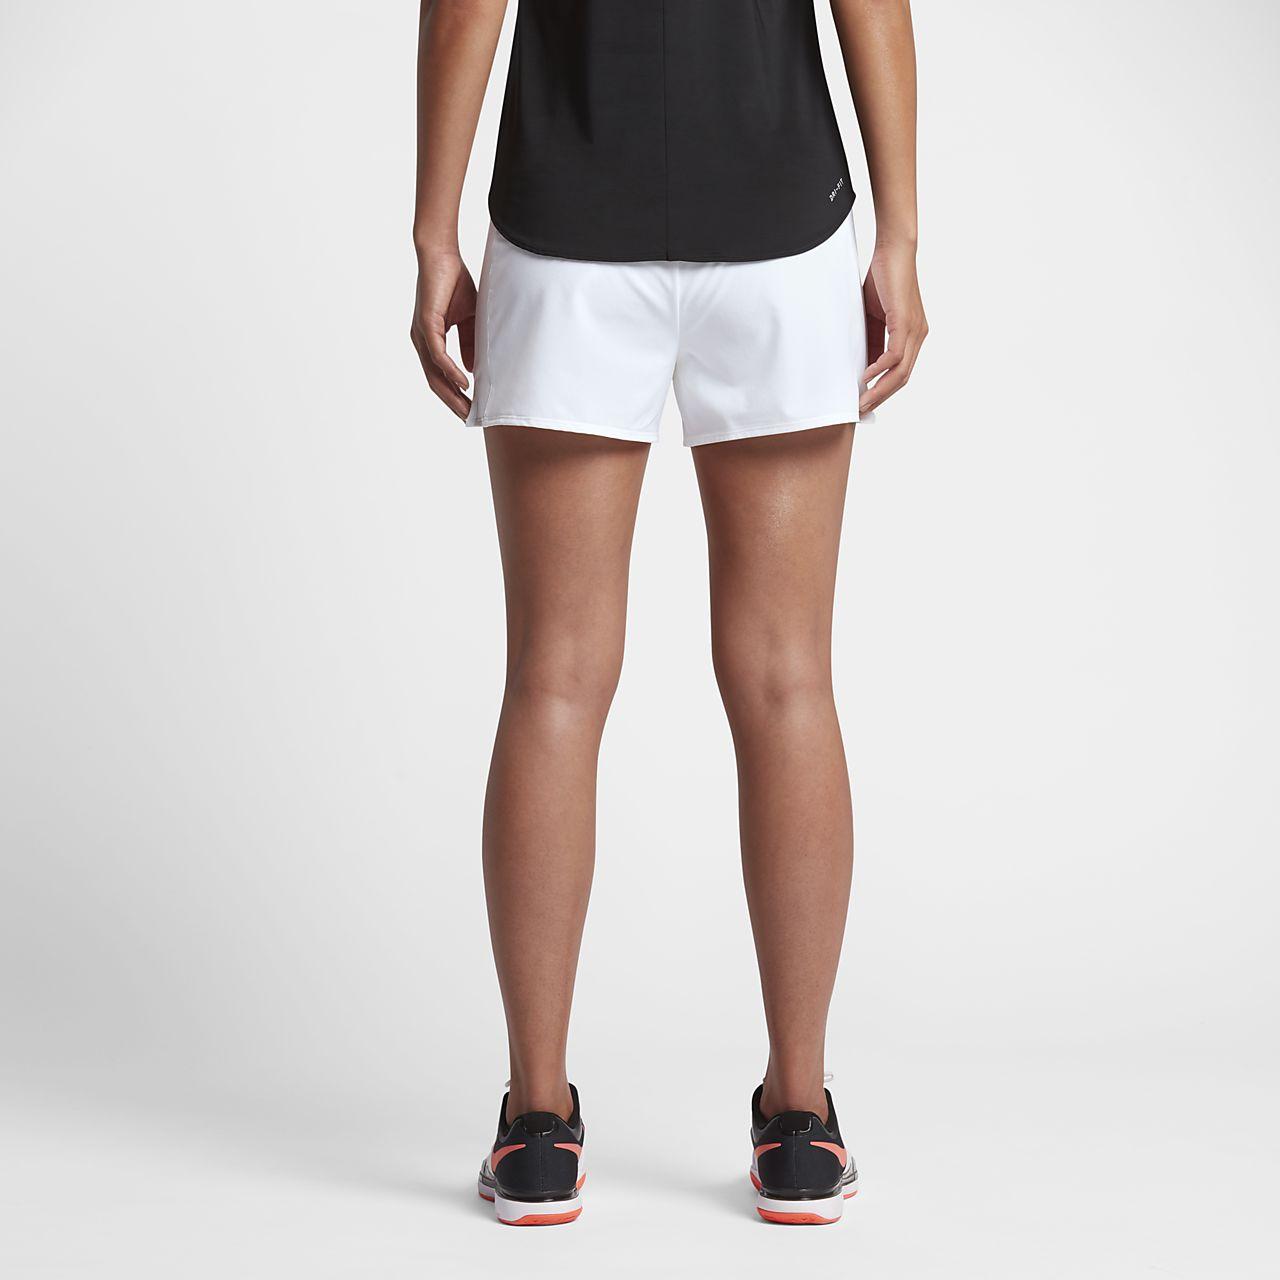 ... NikeCourt Flex Pure Women's Tennis Shorts